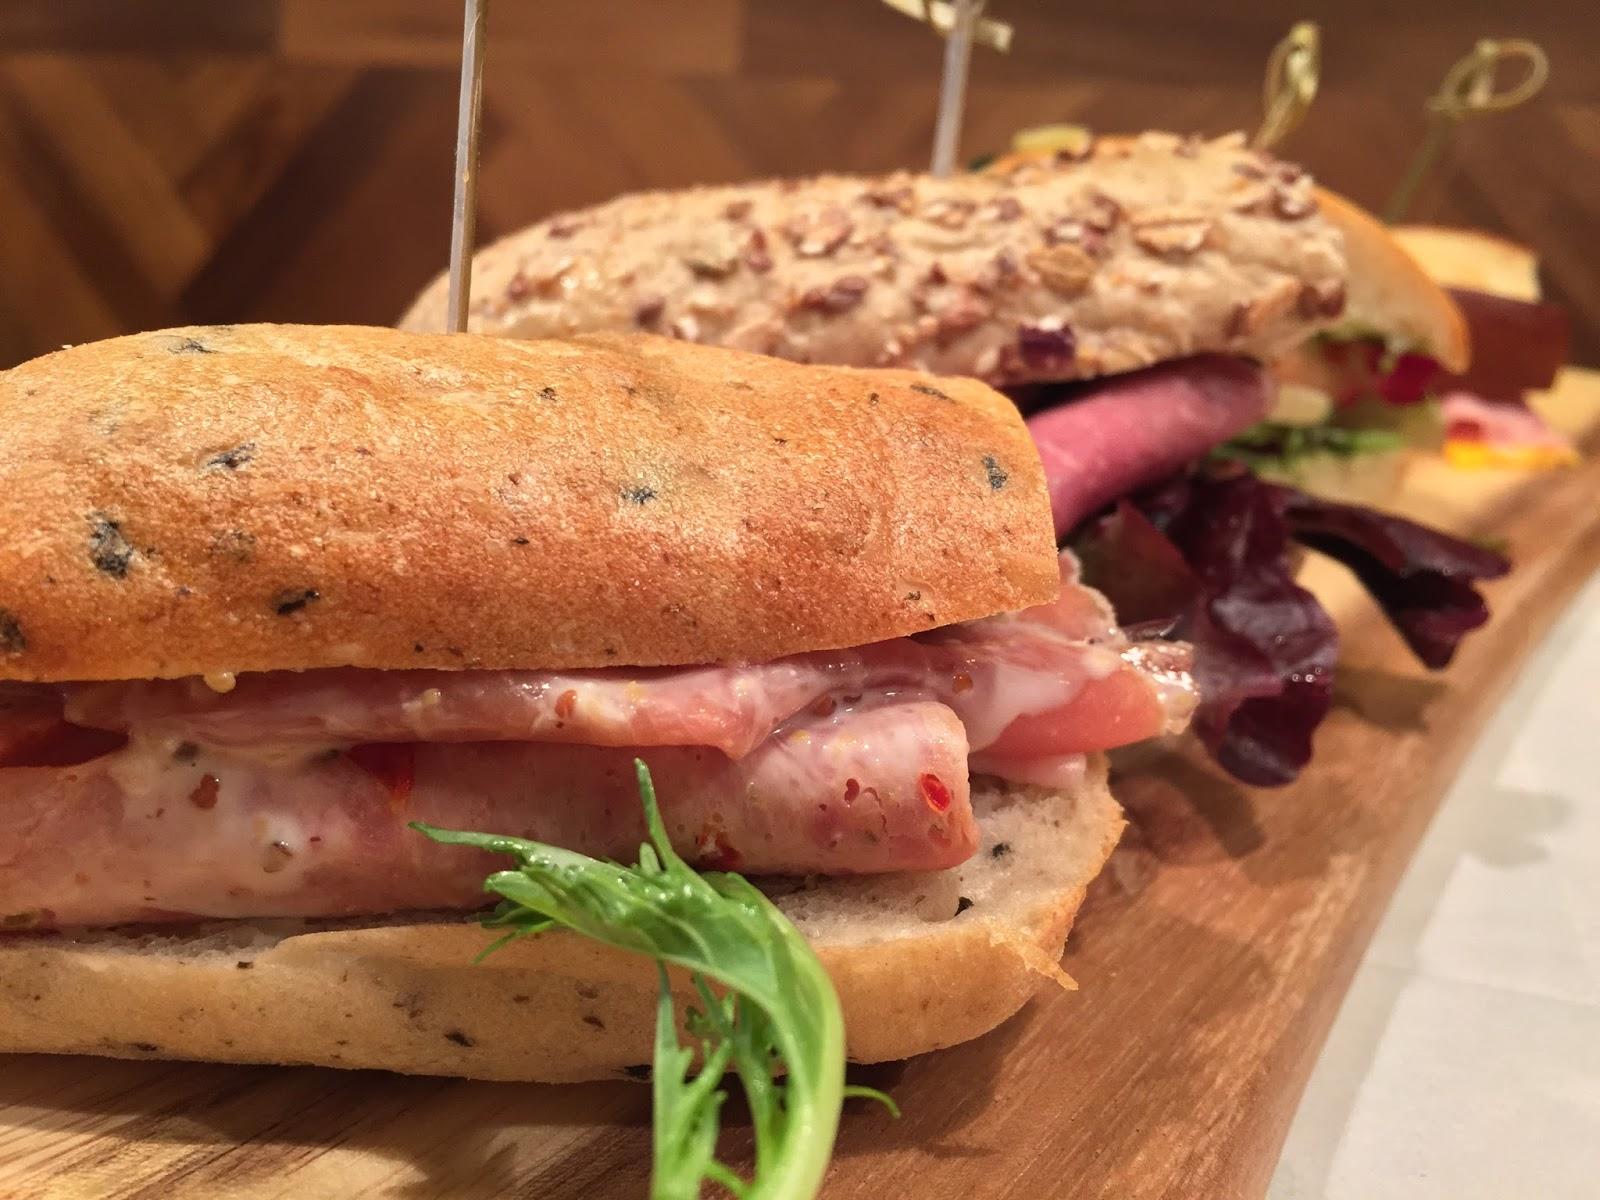 Artisan Sandwiches & Baguette - MEDZS Bistro & Bar